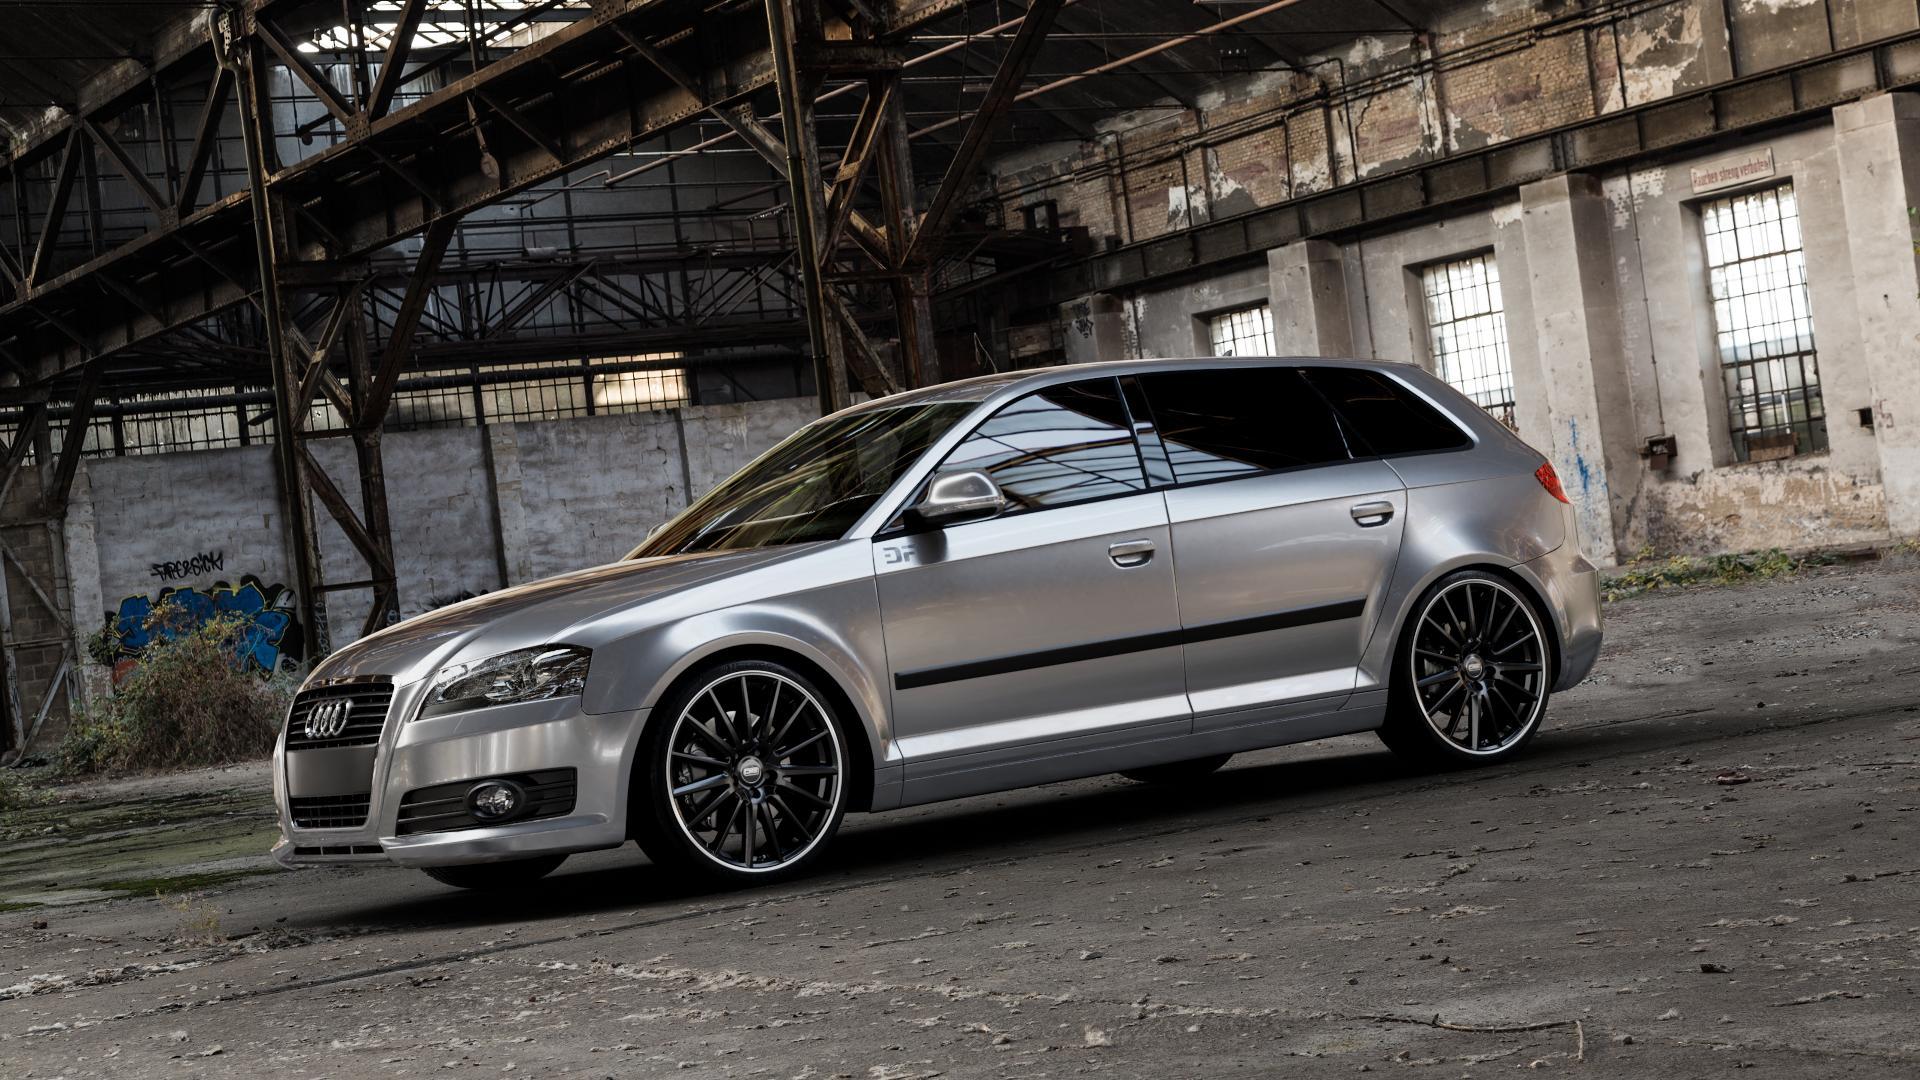 CMS C23 Diamond Rim Black Felge mit Reifen grau schwarz in 19Zoll Winterfelge Alufelge auf silbernem Audi A3 Typ 8P (Sportback) 1,6l 75kW (102 PS) 2,0l FSI 110kW (150 1,9l TDI 77kW (105 103kW (140 TFSI 147kW (200 85kW (116 100kW (136 1,8l 118kW (160 125kW (170 1,4l 92kW (125 120kW (163 quattro 3,2l V6 184kW (250 S3 195kW (265 1,2l 66kW (90